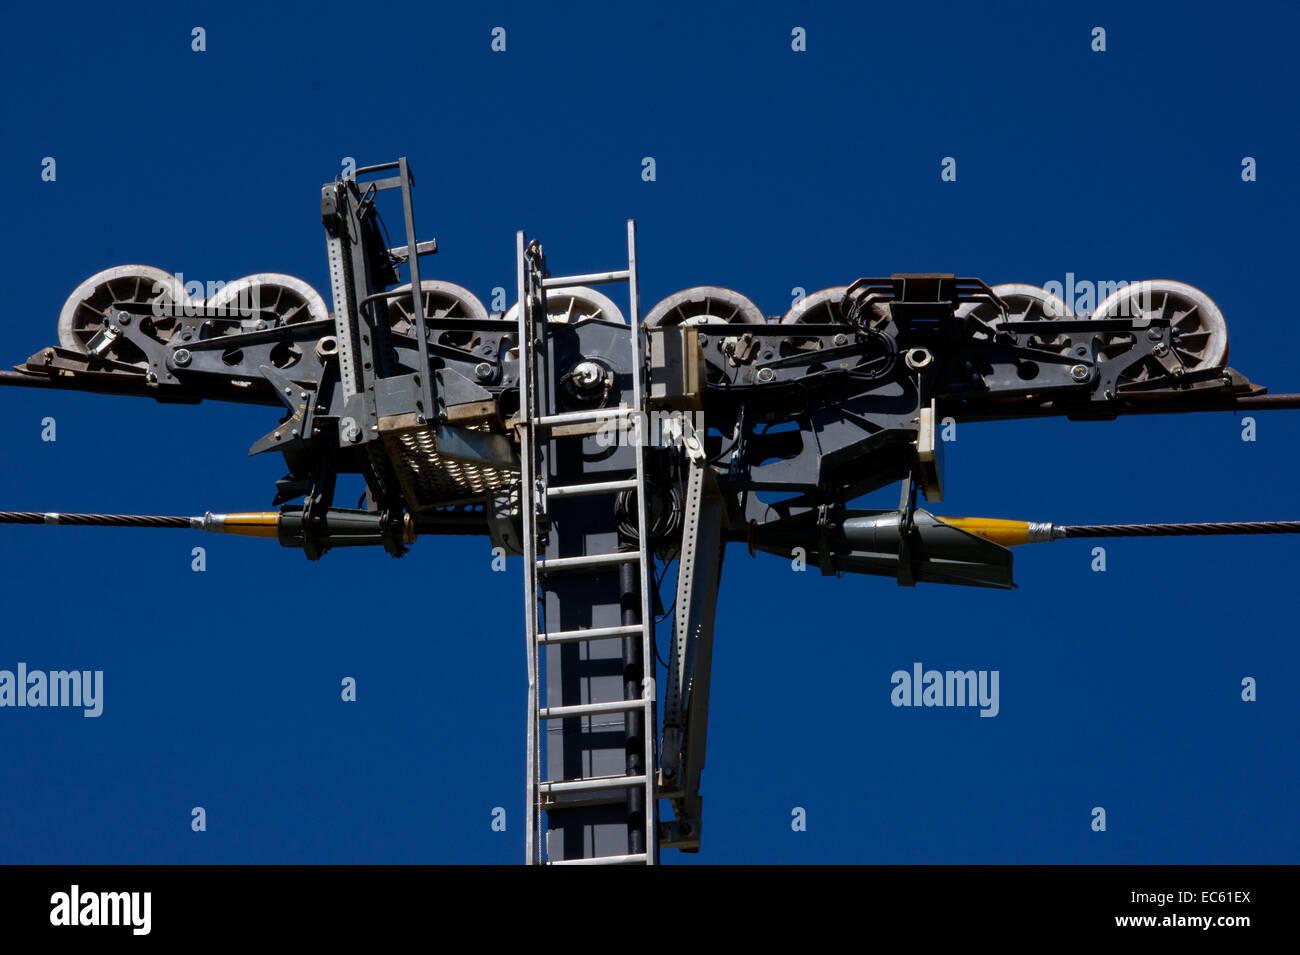 suspension system photos suspension system images alamy. Black Bedroom Furniture Sets. Home Design Ideas